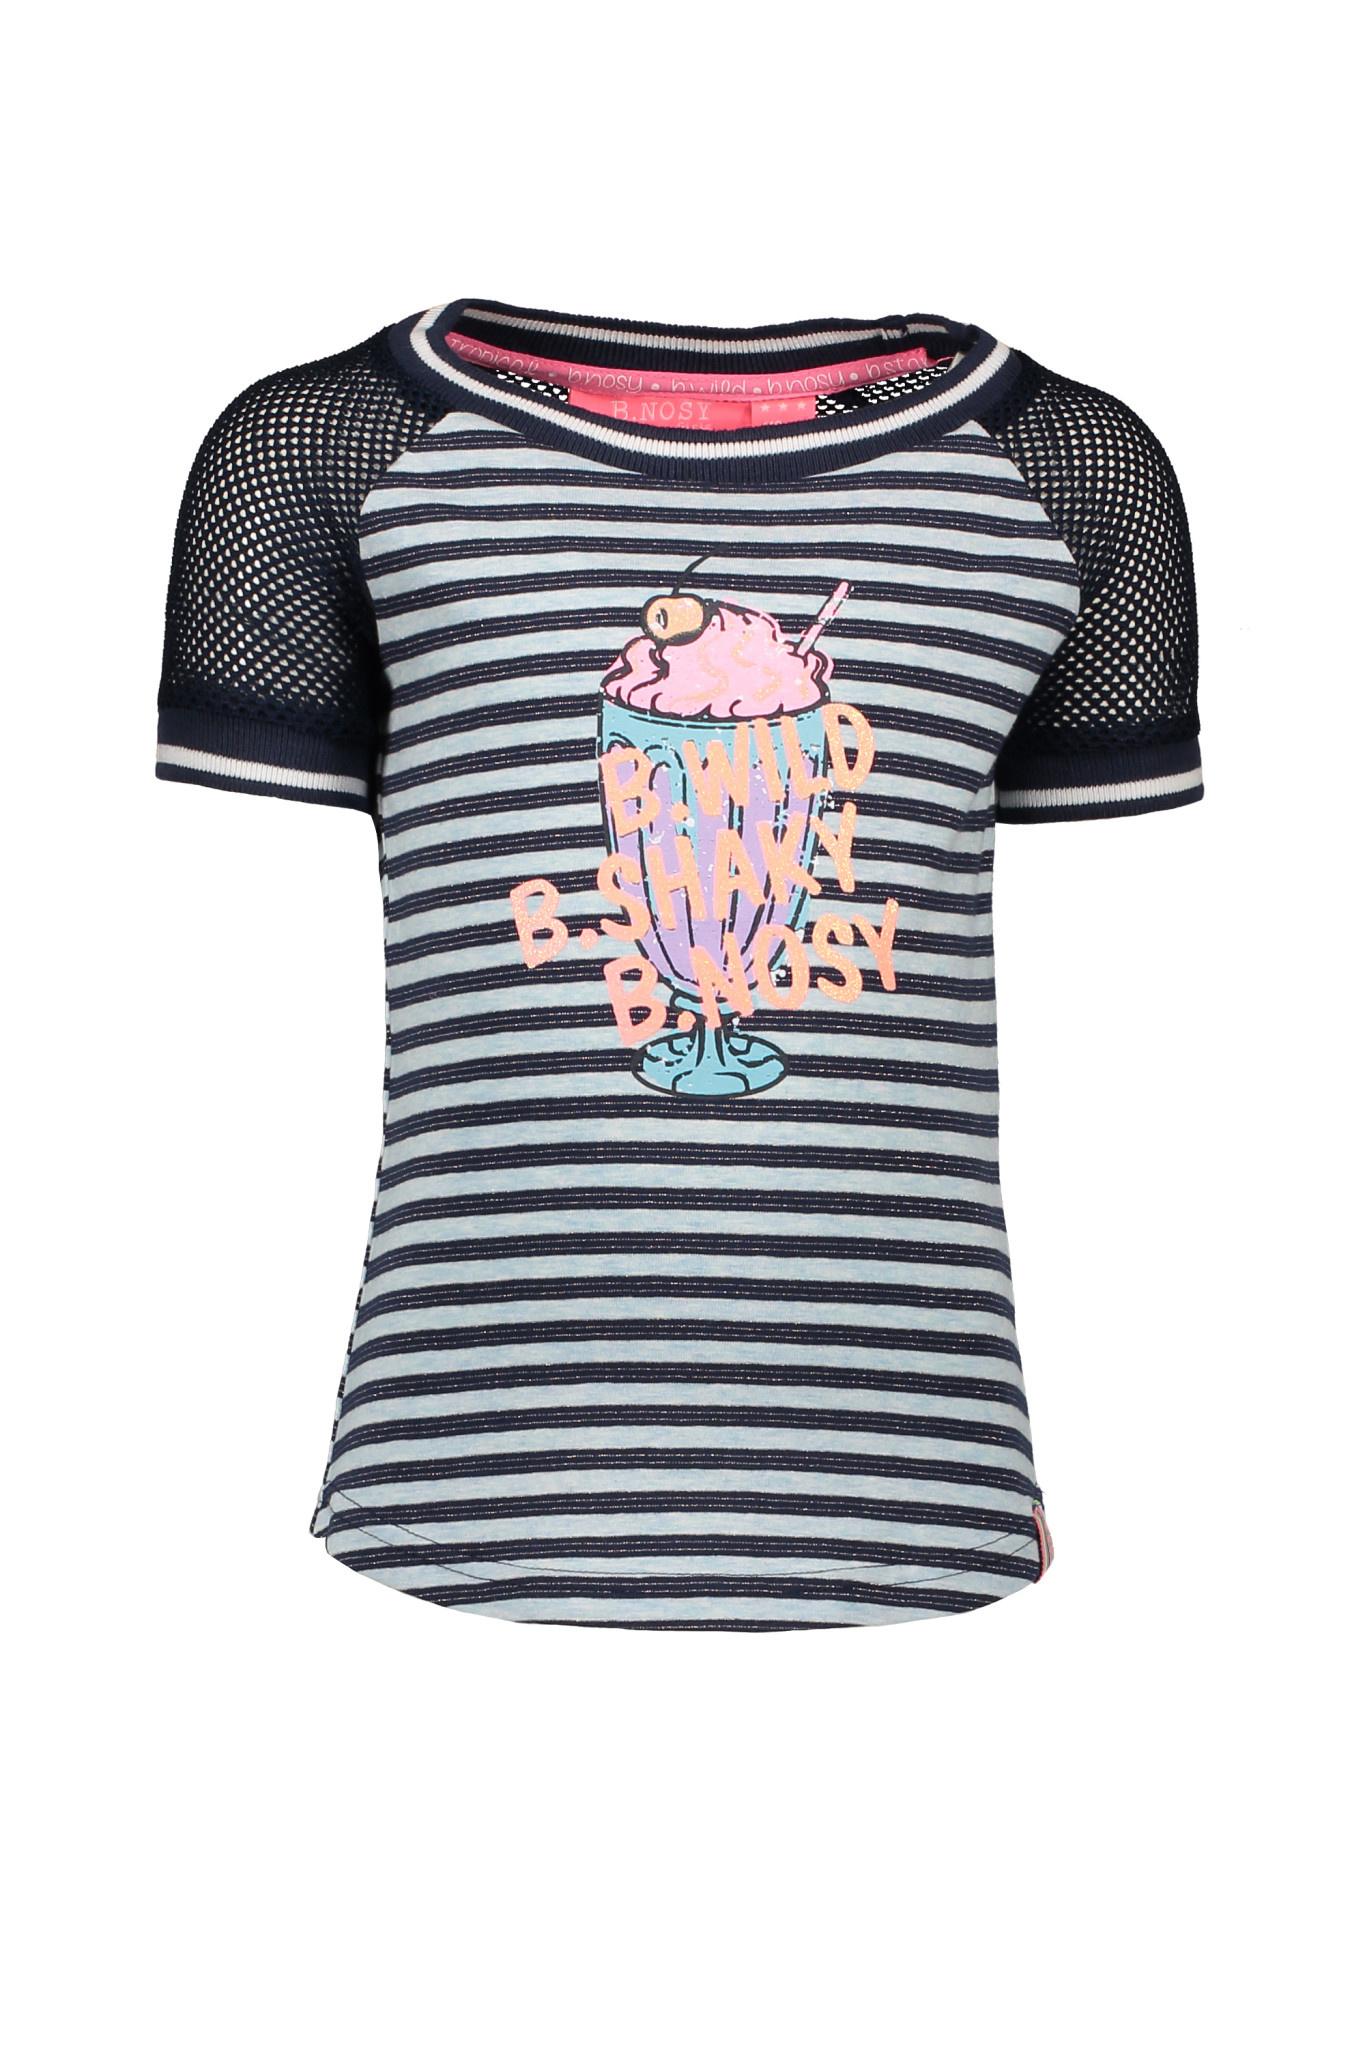 B.Nosy B.Nosy T-shirt raglan stripe skydelight melee matching lurex